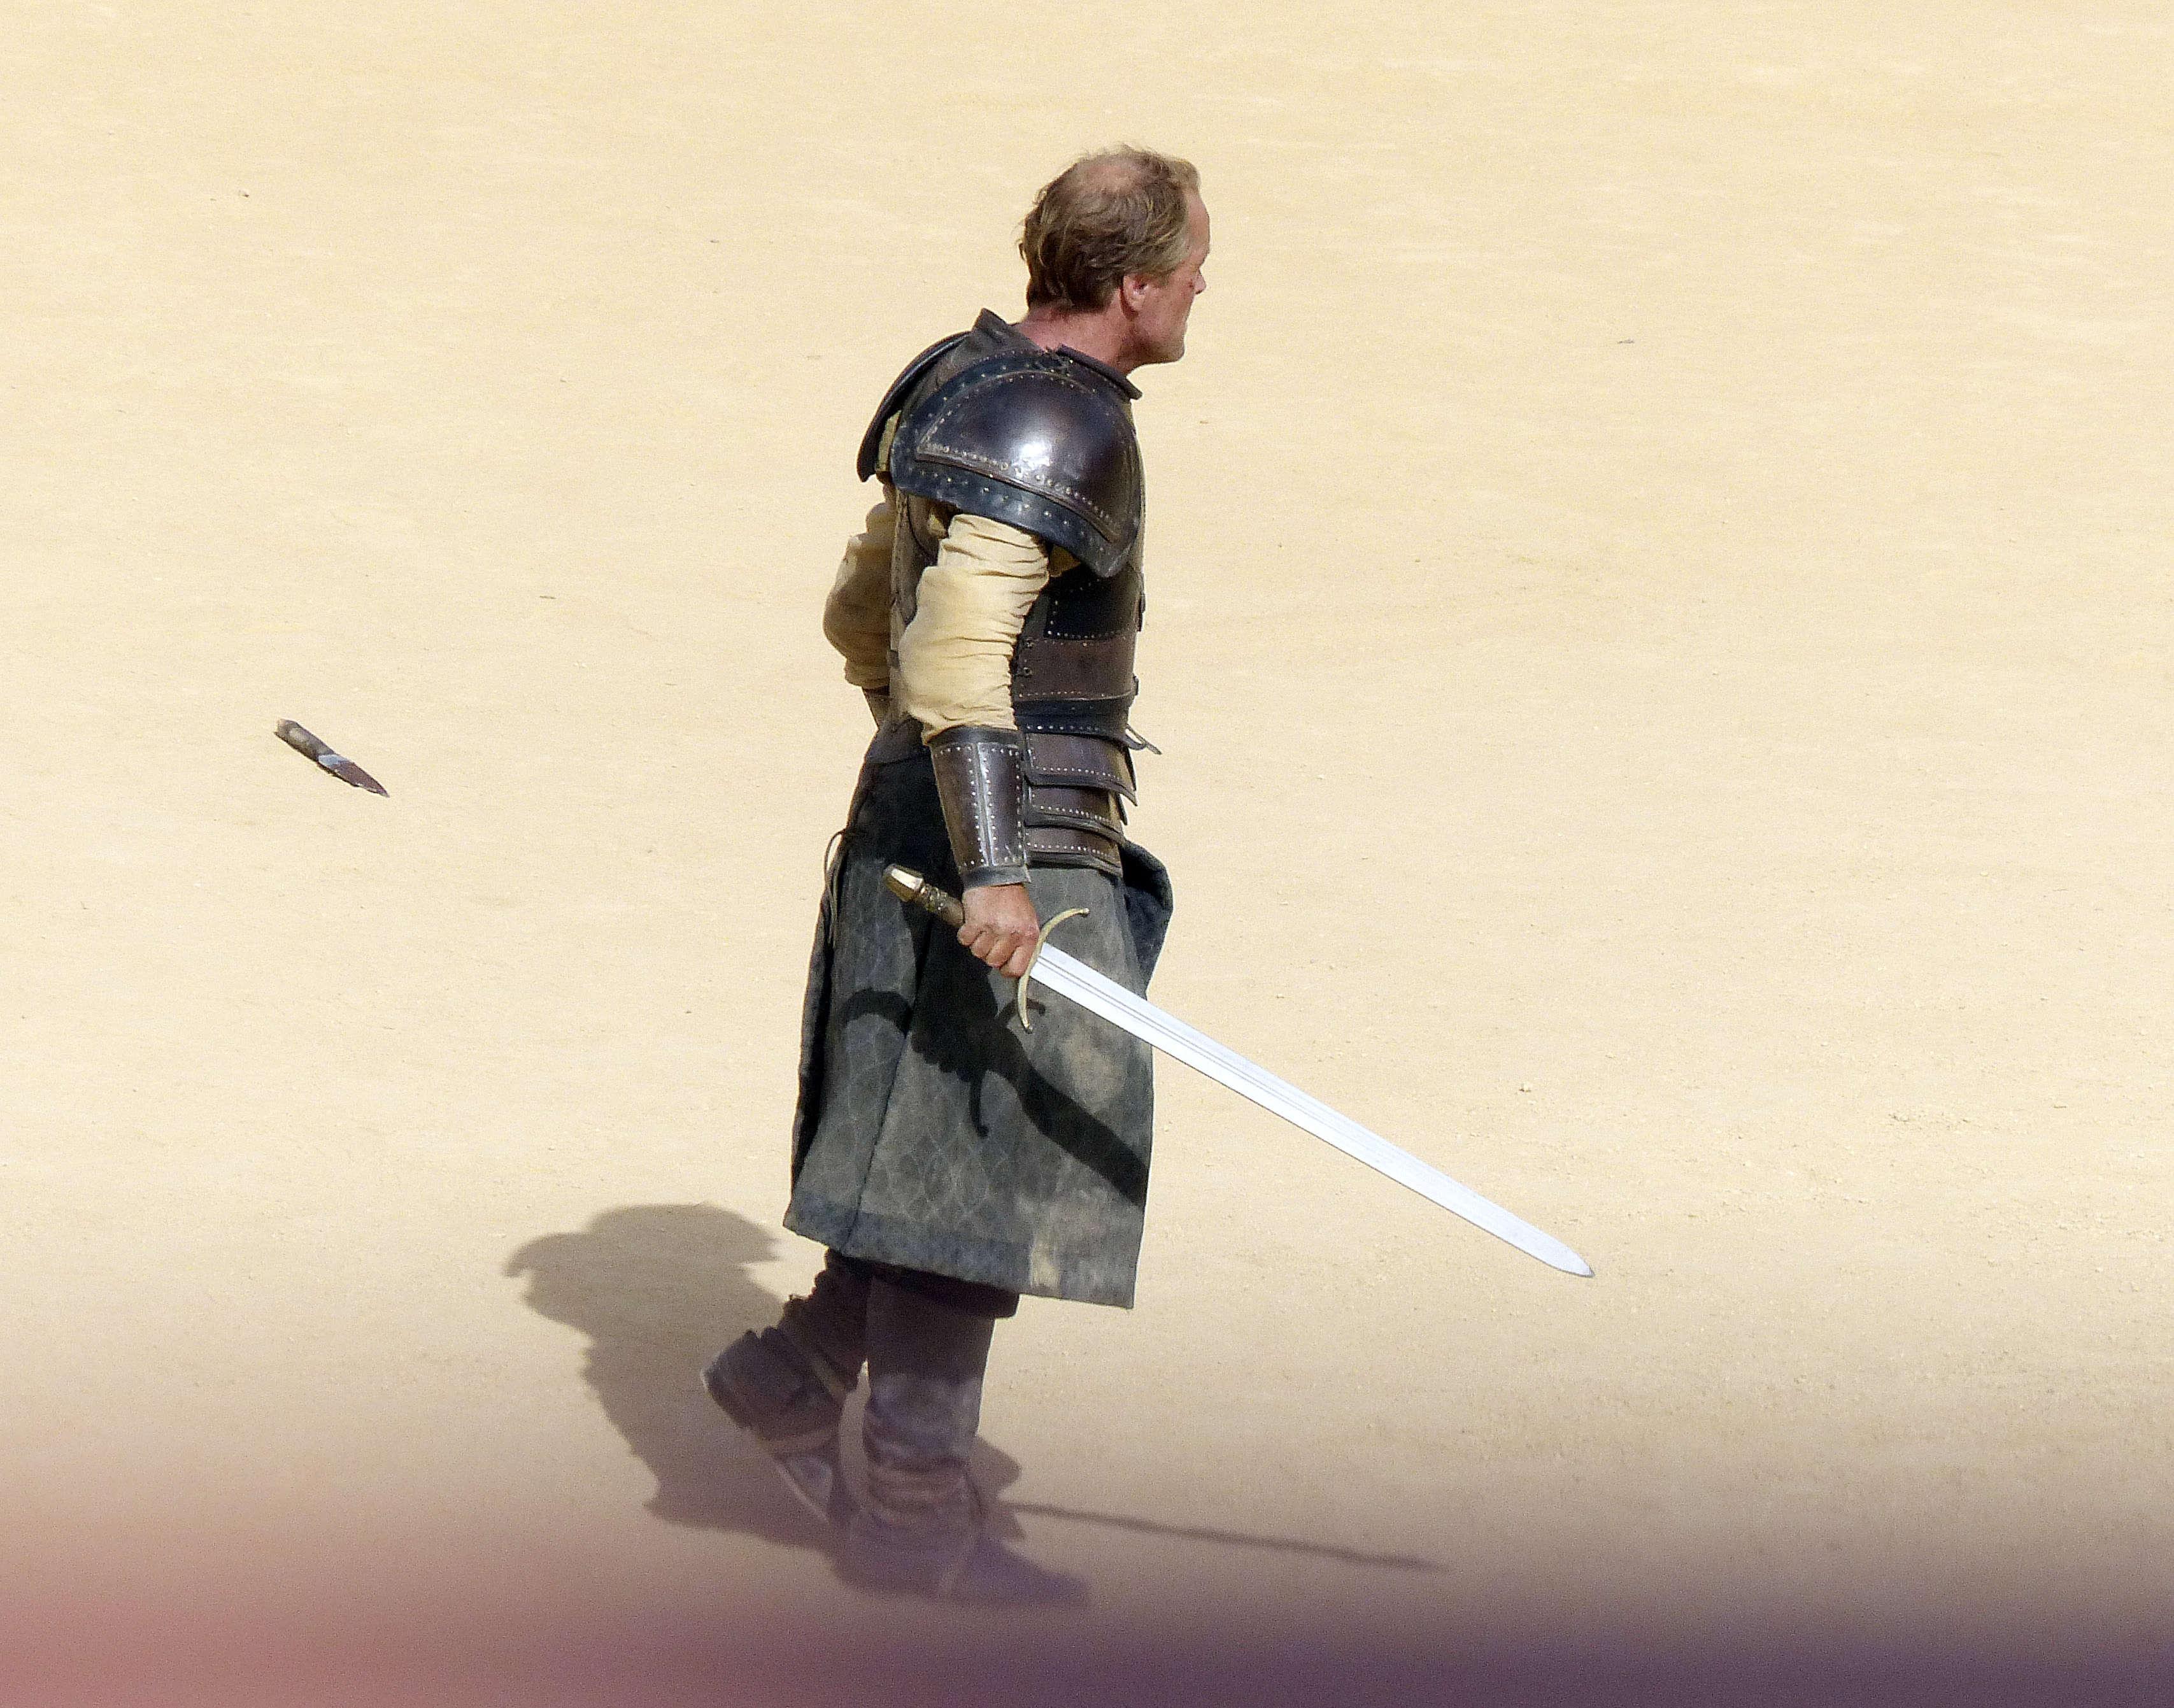 Jorah Mormont - Season 5 - Jorah Mormont Photo (37763559) - Fanpop